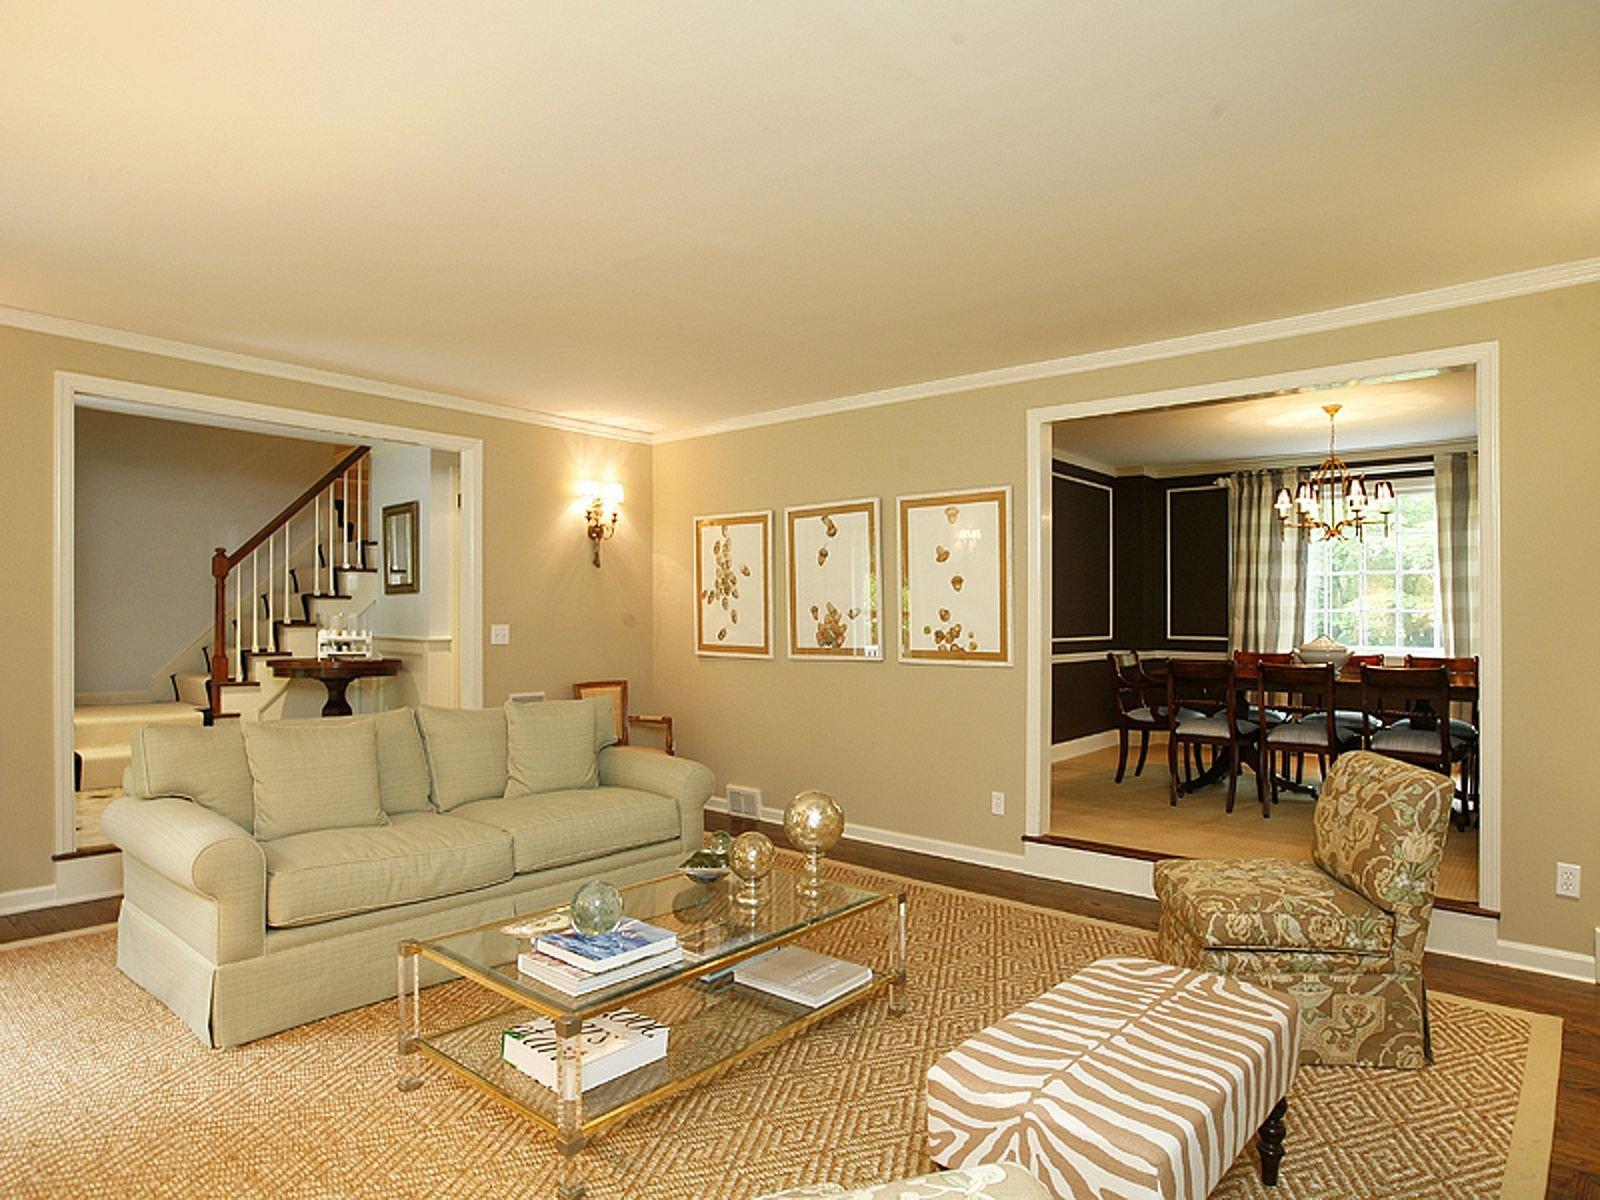 Small formal Living Room Ideas Luxury formal Living Room Ideas In Elegant Look Dream House Small formal Living Room Ideas Cbrn